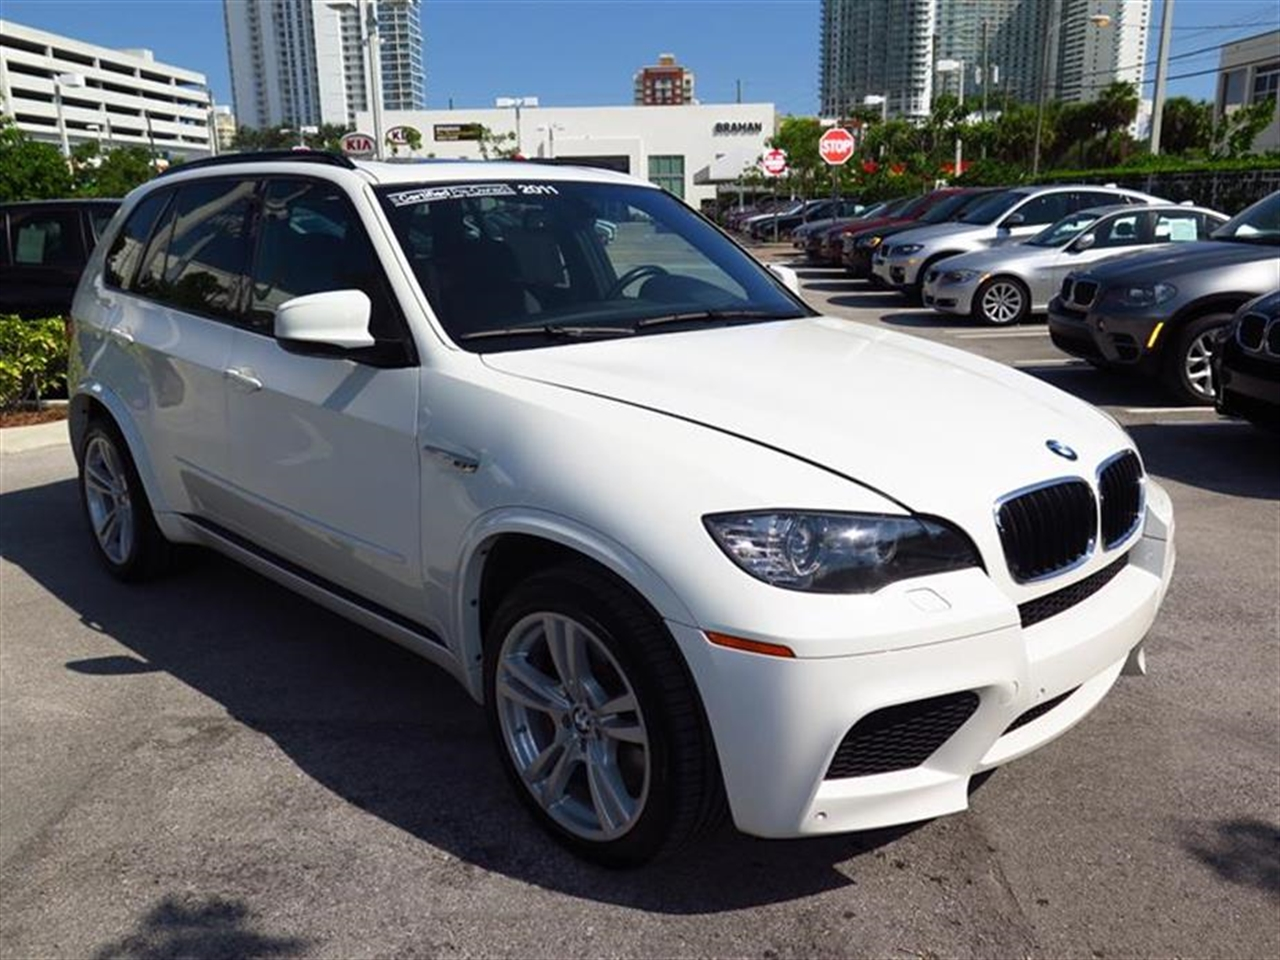 2011 BMW X5 M AWD 4dr 48979 miles VIN 5YMGY0C52BLK26984